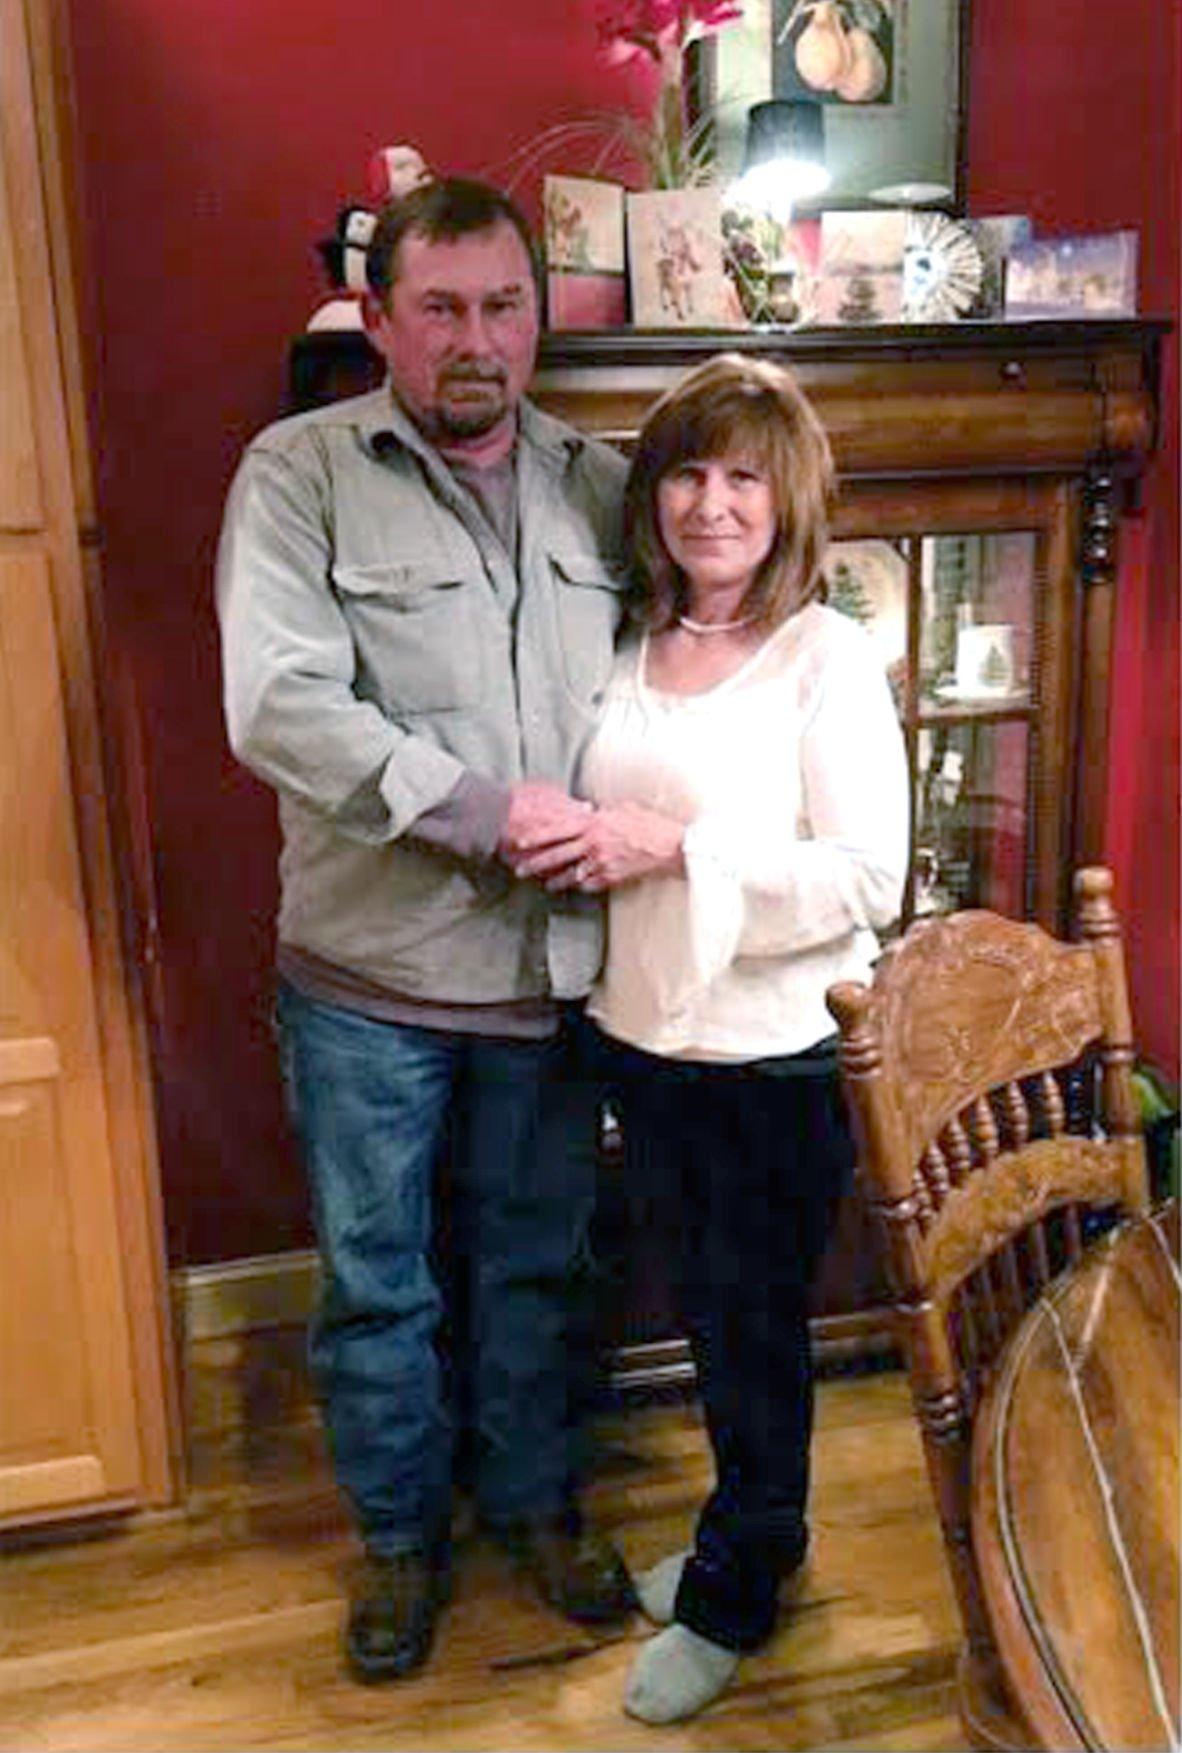 Tommy Barron and Meredith Ingle